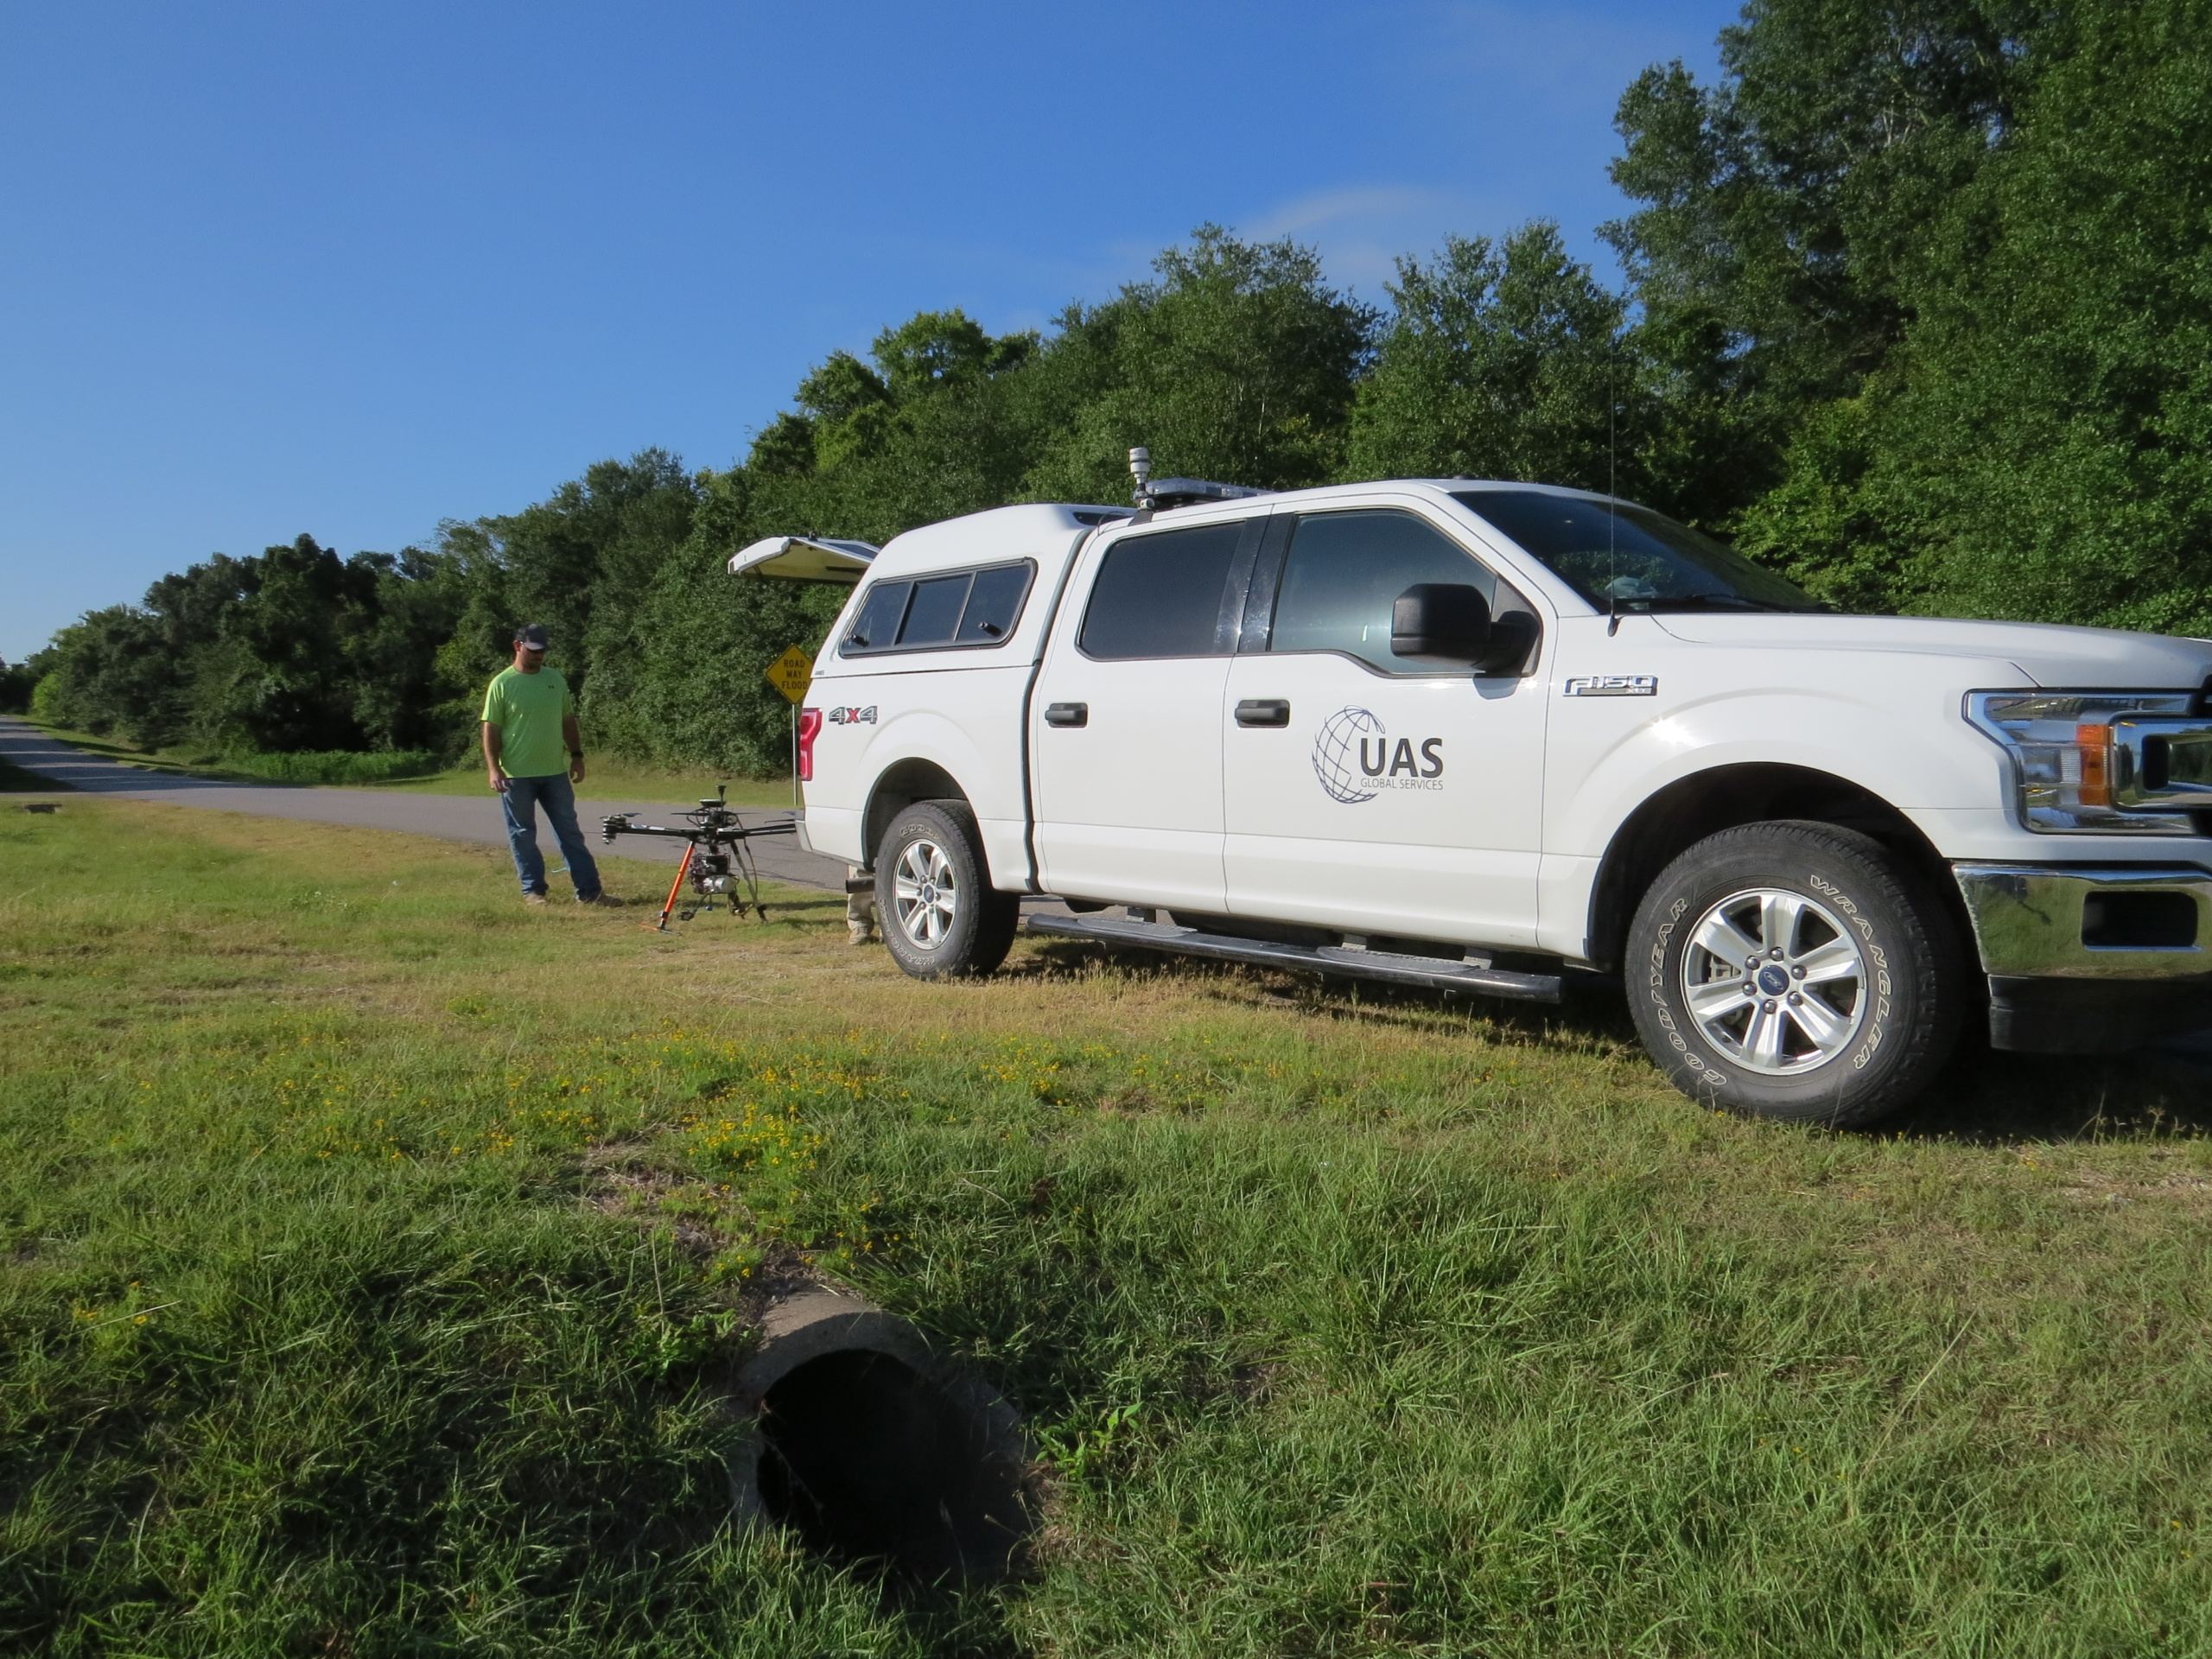 Drone LiDAR Flight Crew Survey Texas